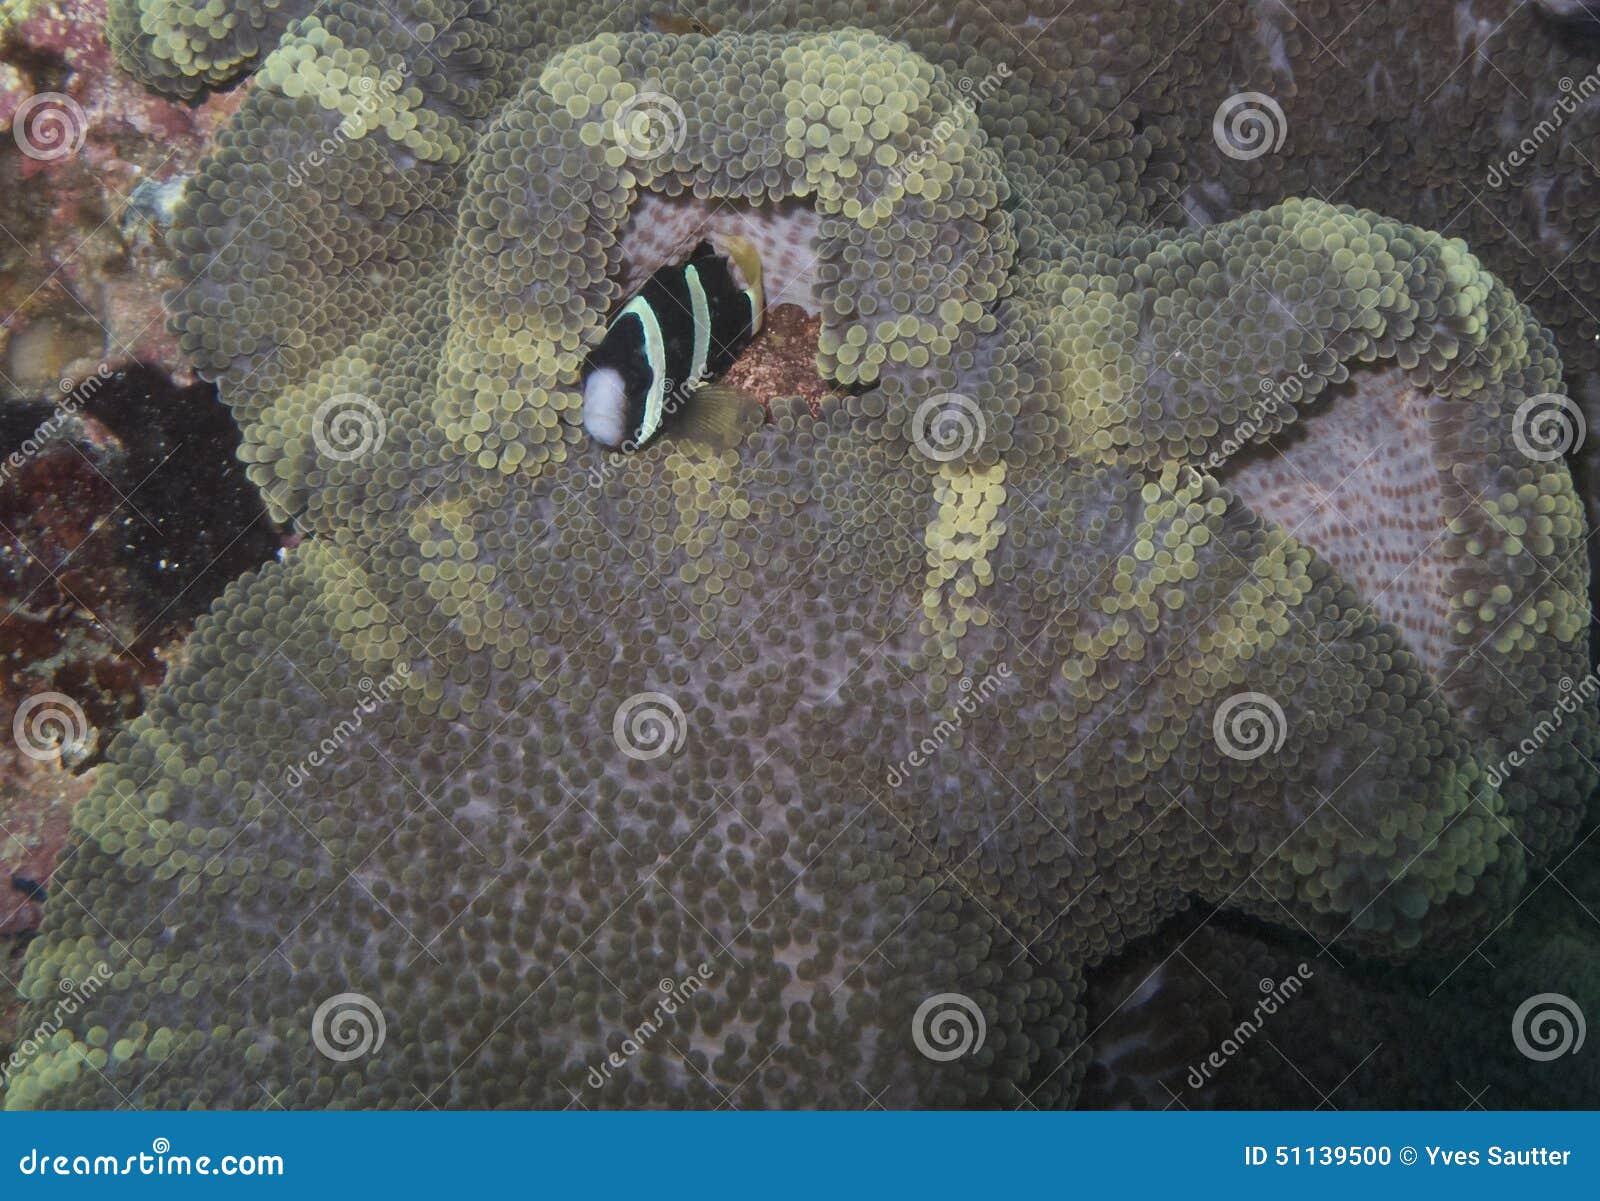 Clown Fish in Zeldzame Anemoon, Balicasag-Eiland, Bohol, Filippijnen